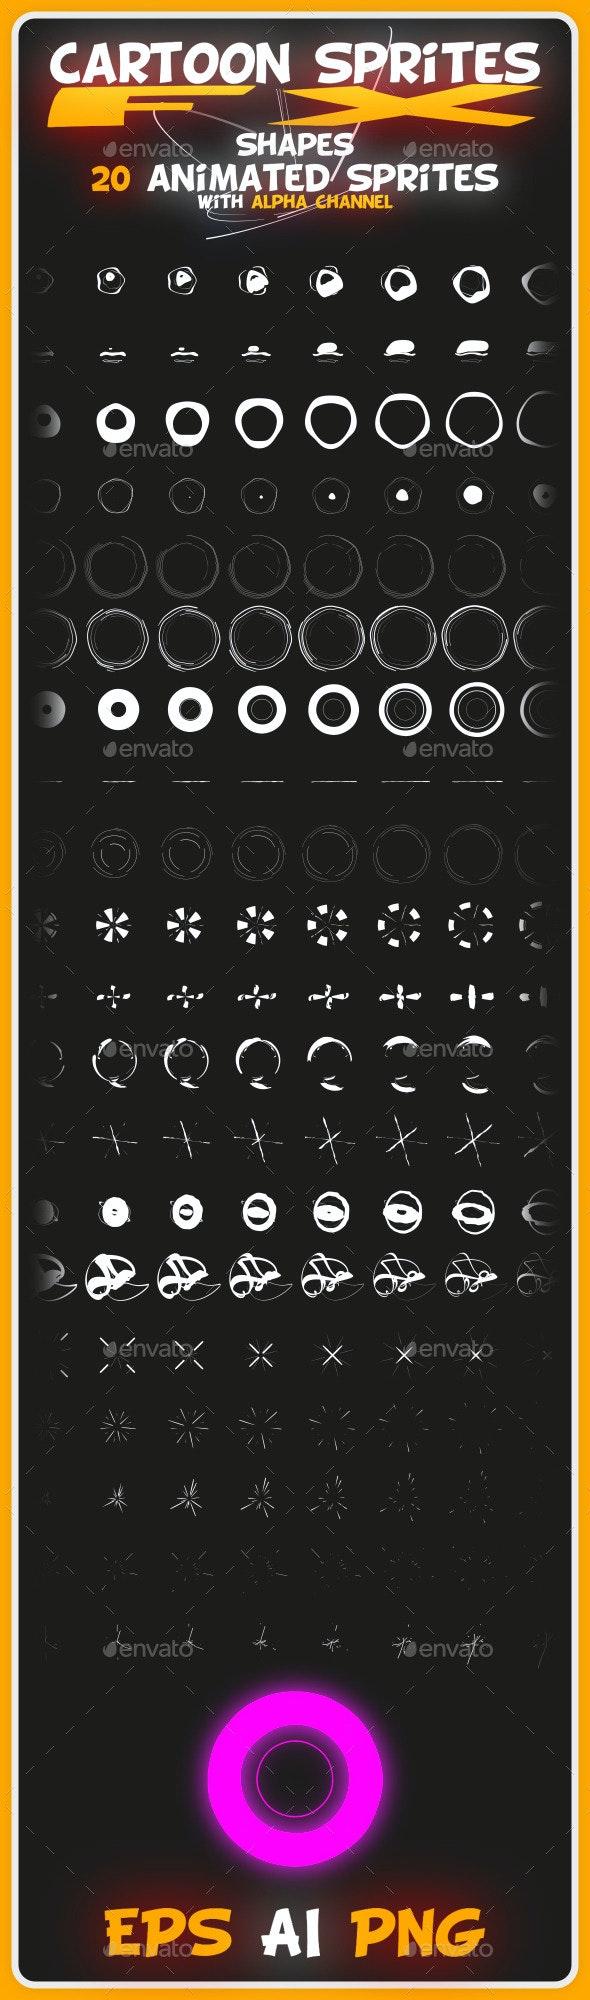 Cartoon Sprites FX (Shapes) - Sprites Game Assets